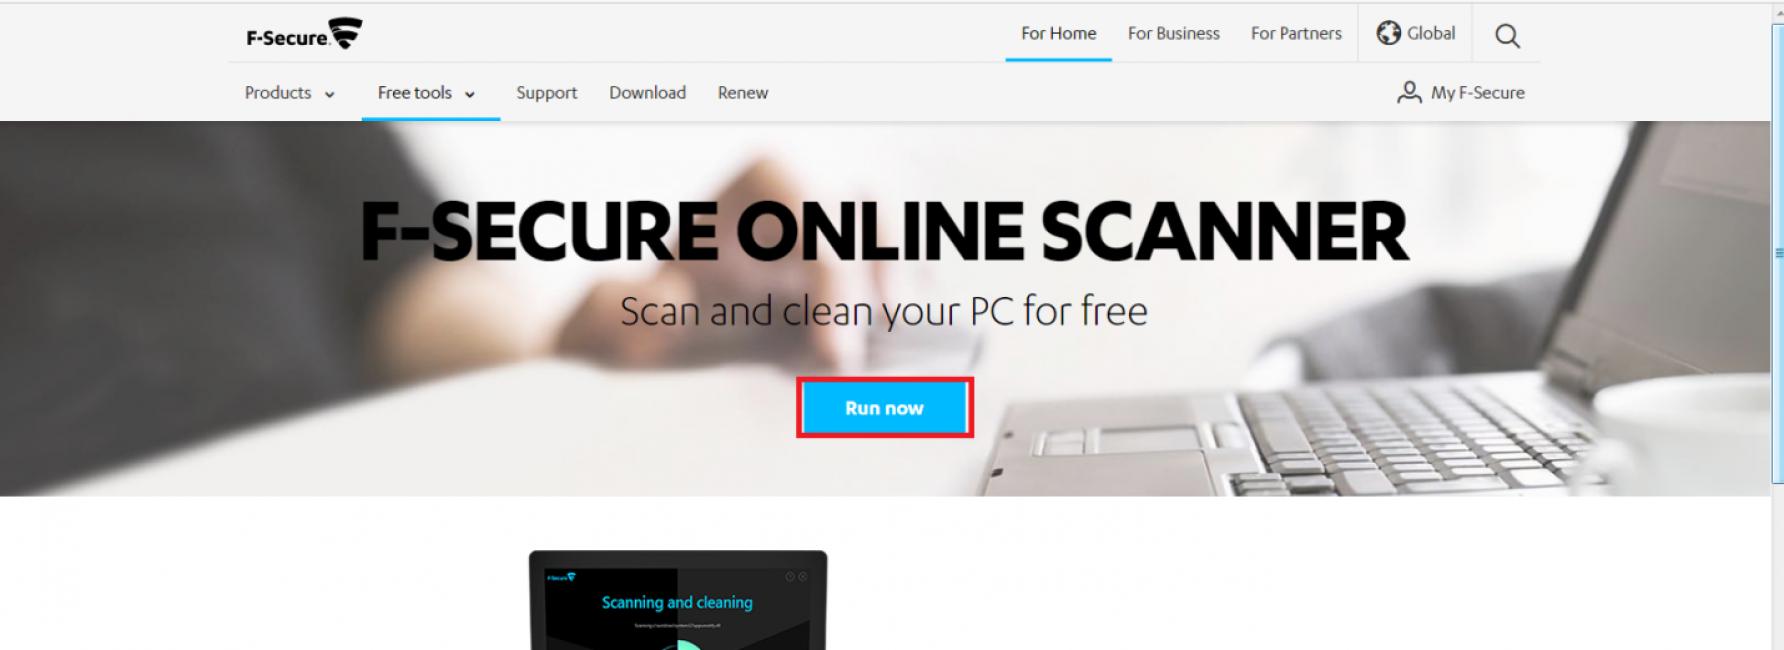 Сервис F-Secure Online Scanner